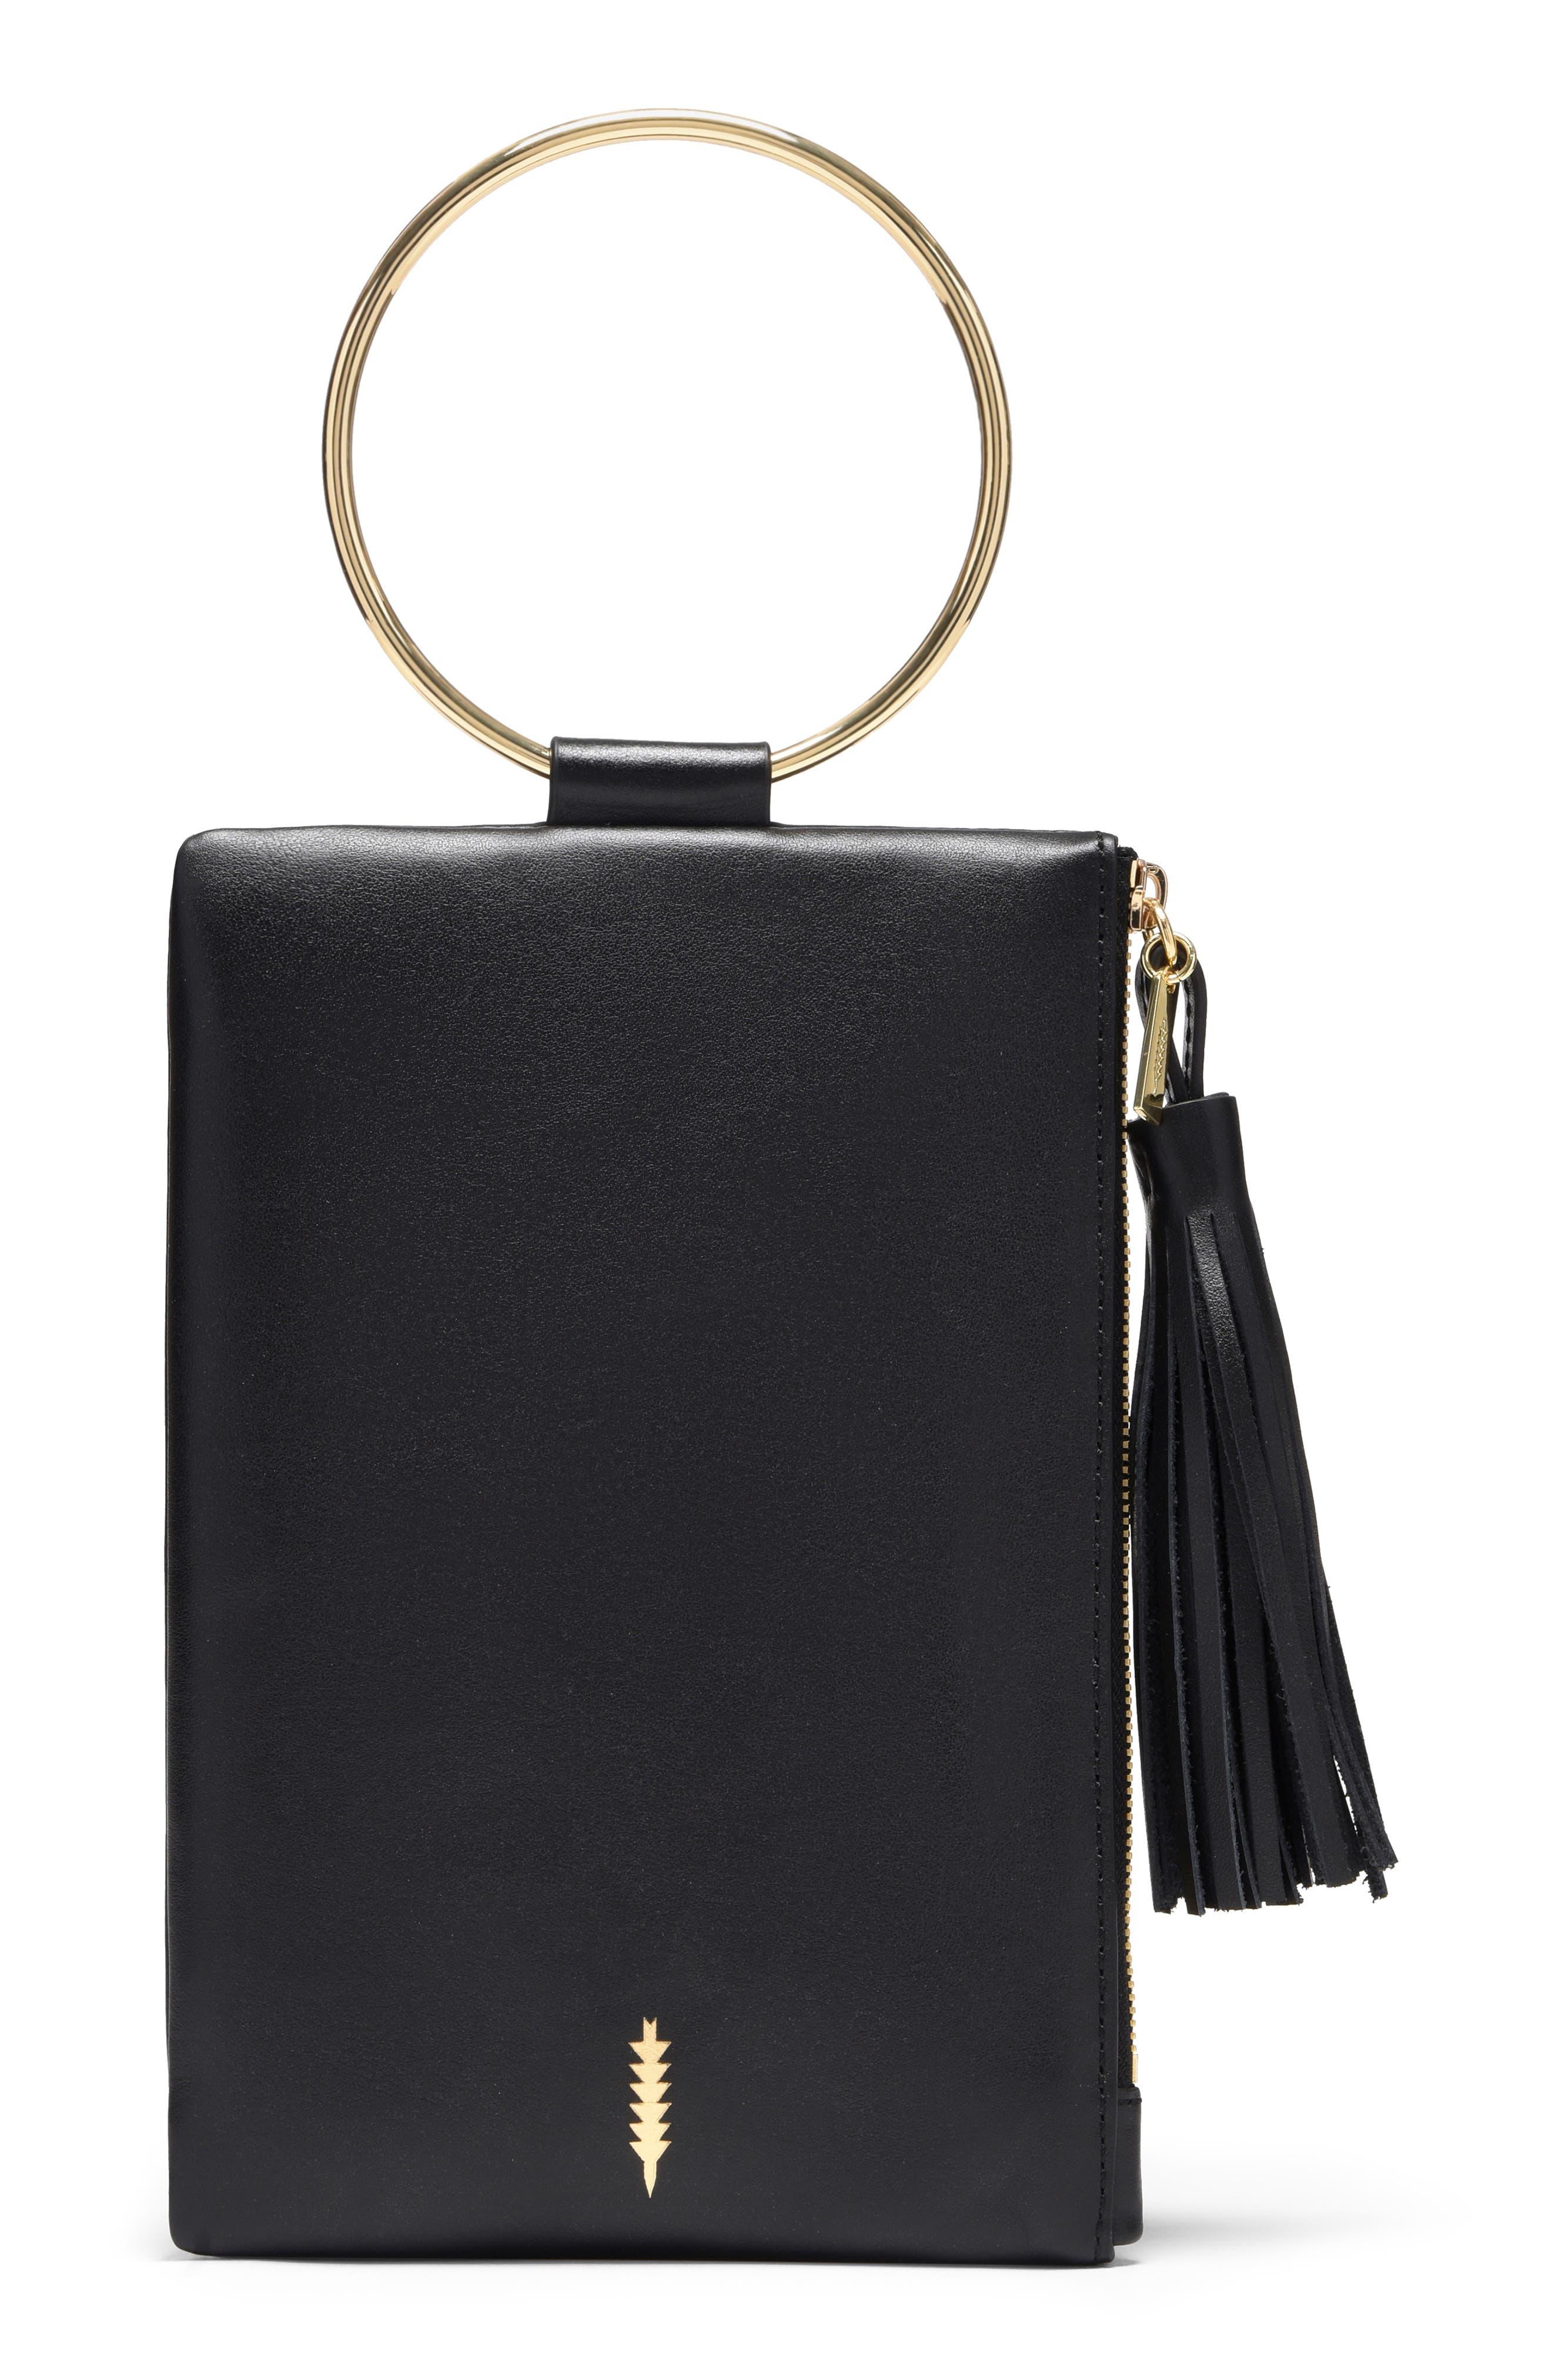 Nolita Ring Handle Leather Clutch,                             Main thumbnail 1, color,                             BLACK GOLD